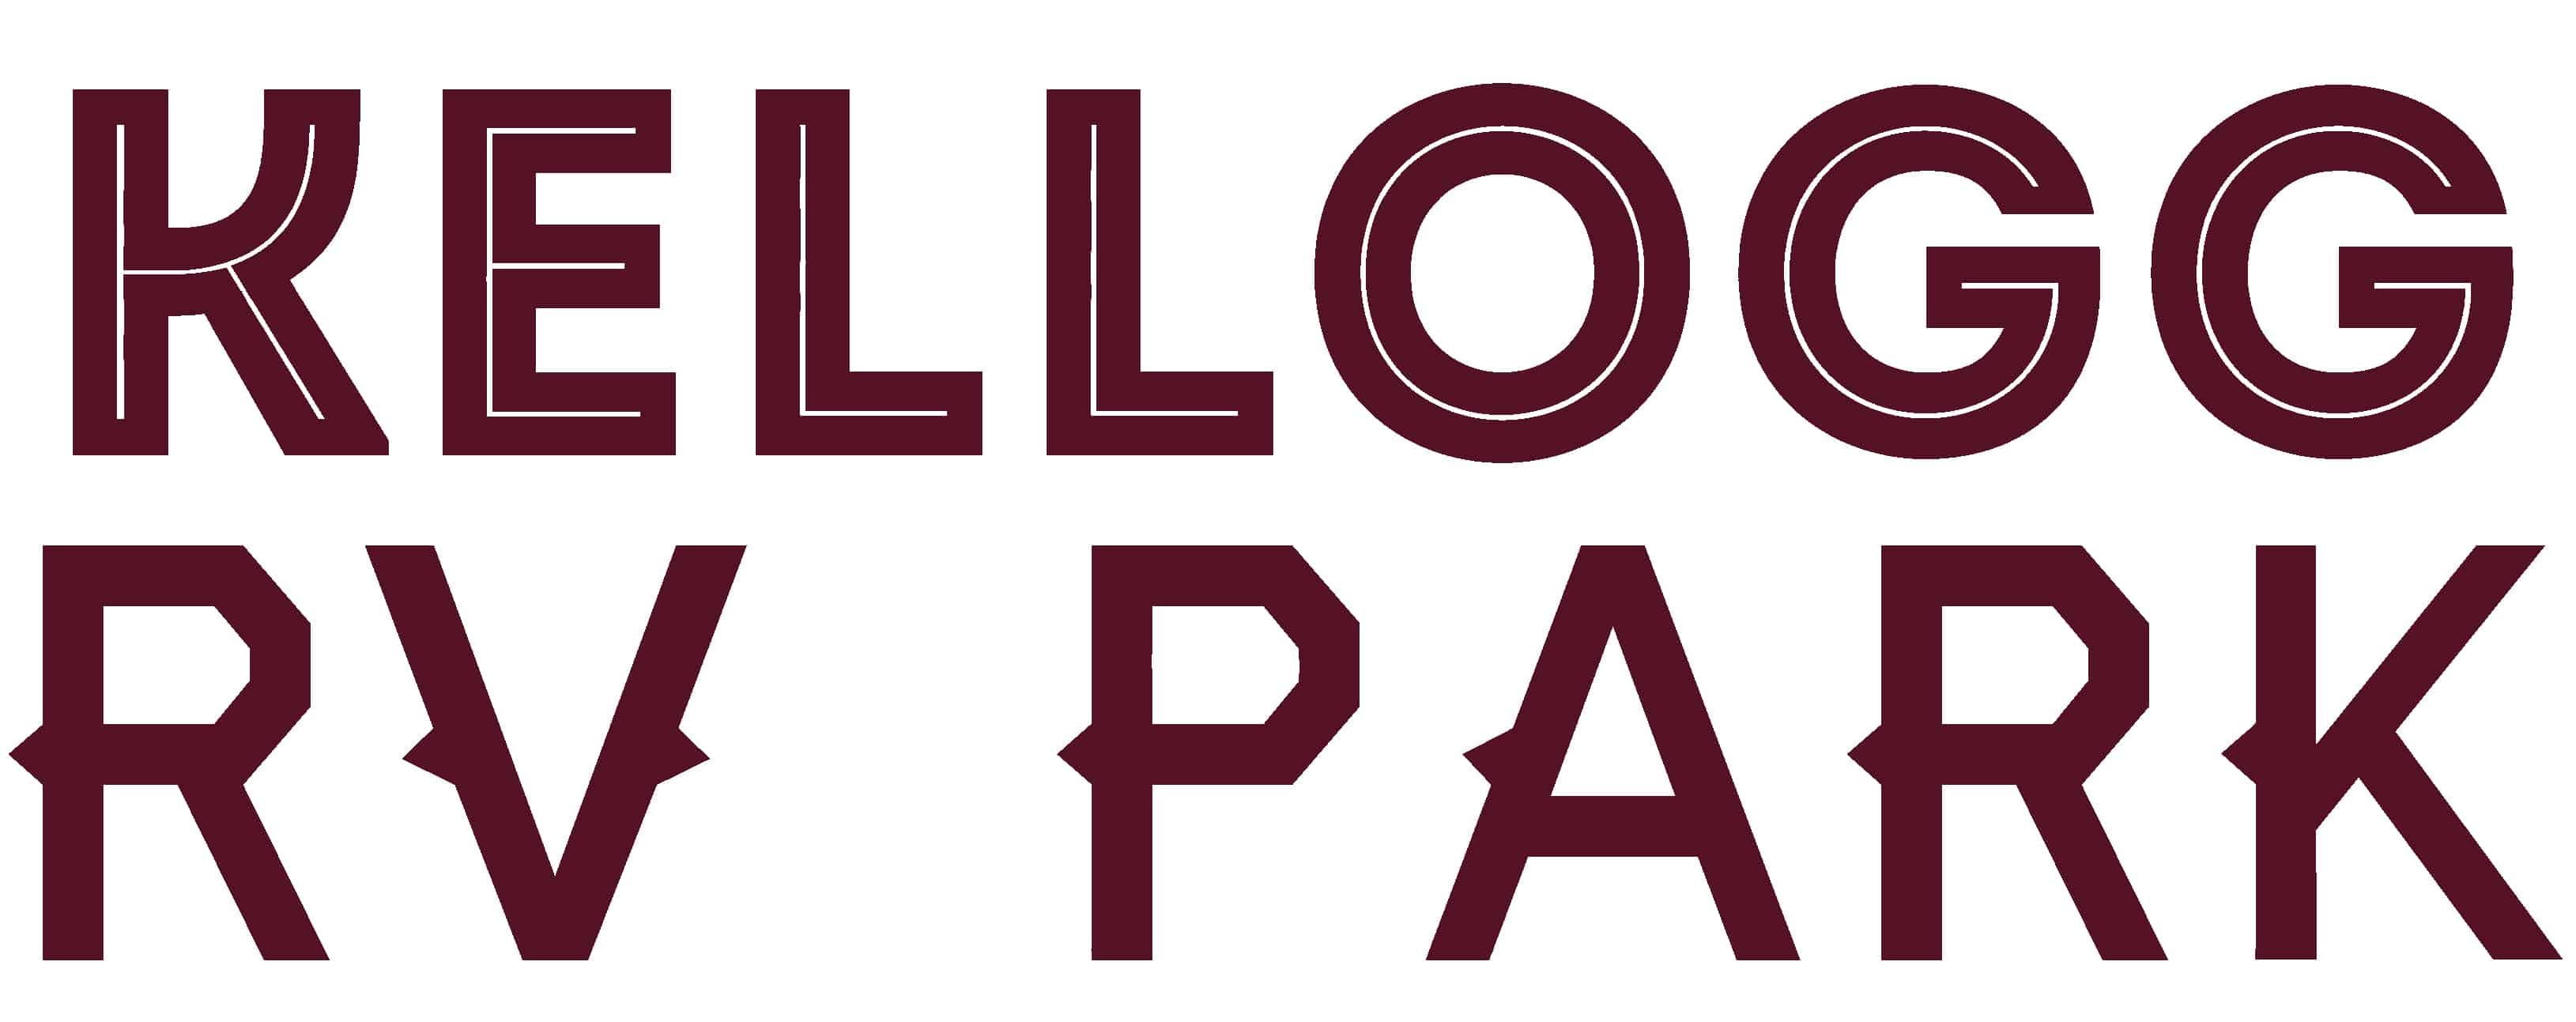 Kellogg RV ParkKellogg RV Park logo